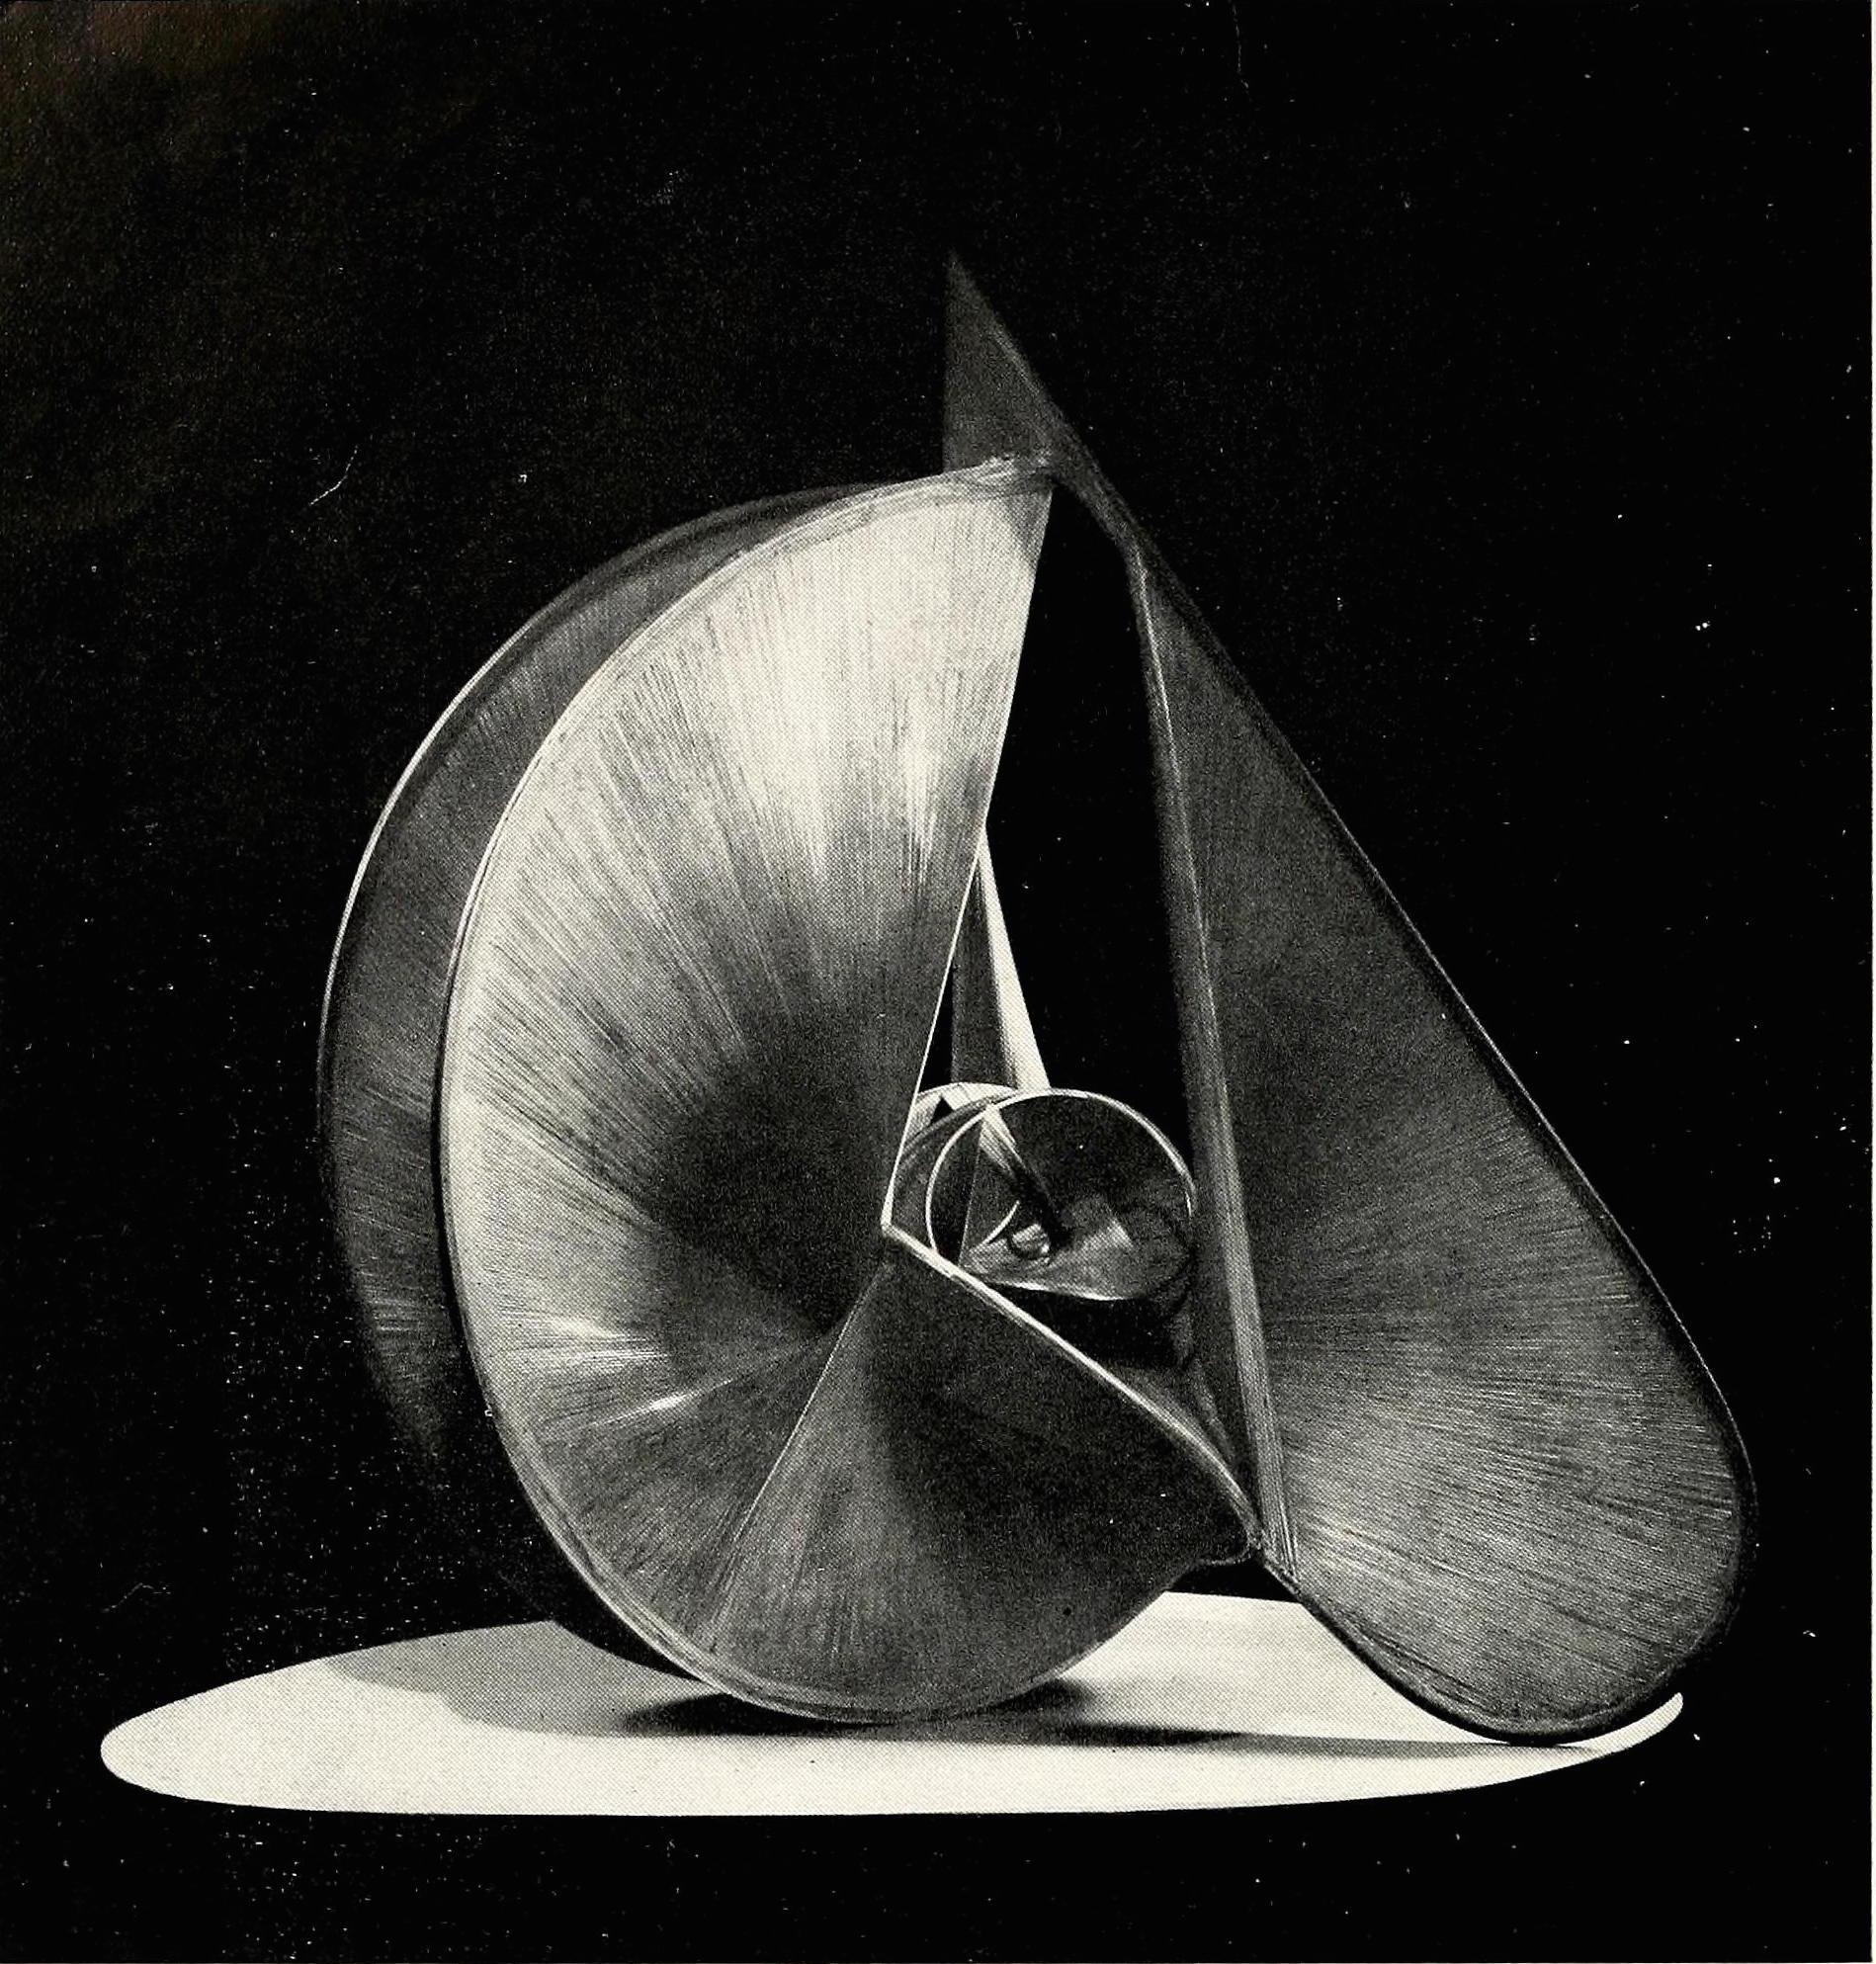 Naum Gabo, World construction (1947)